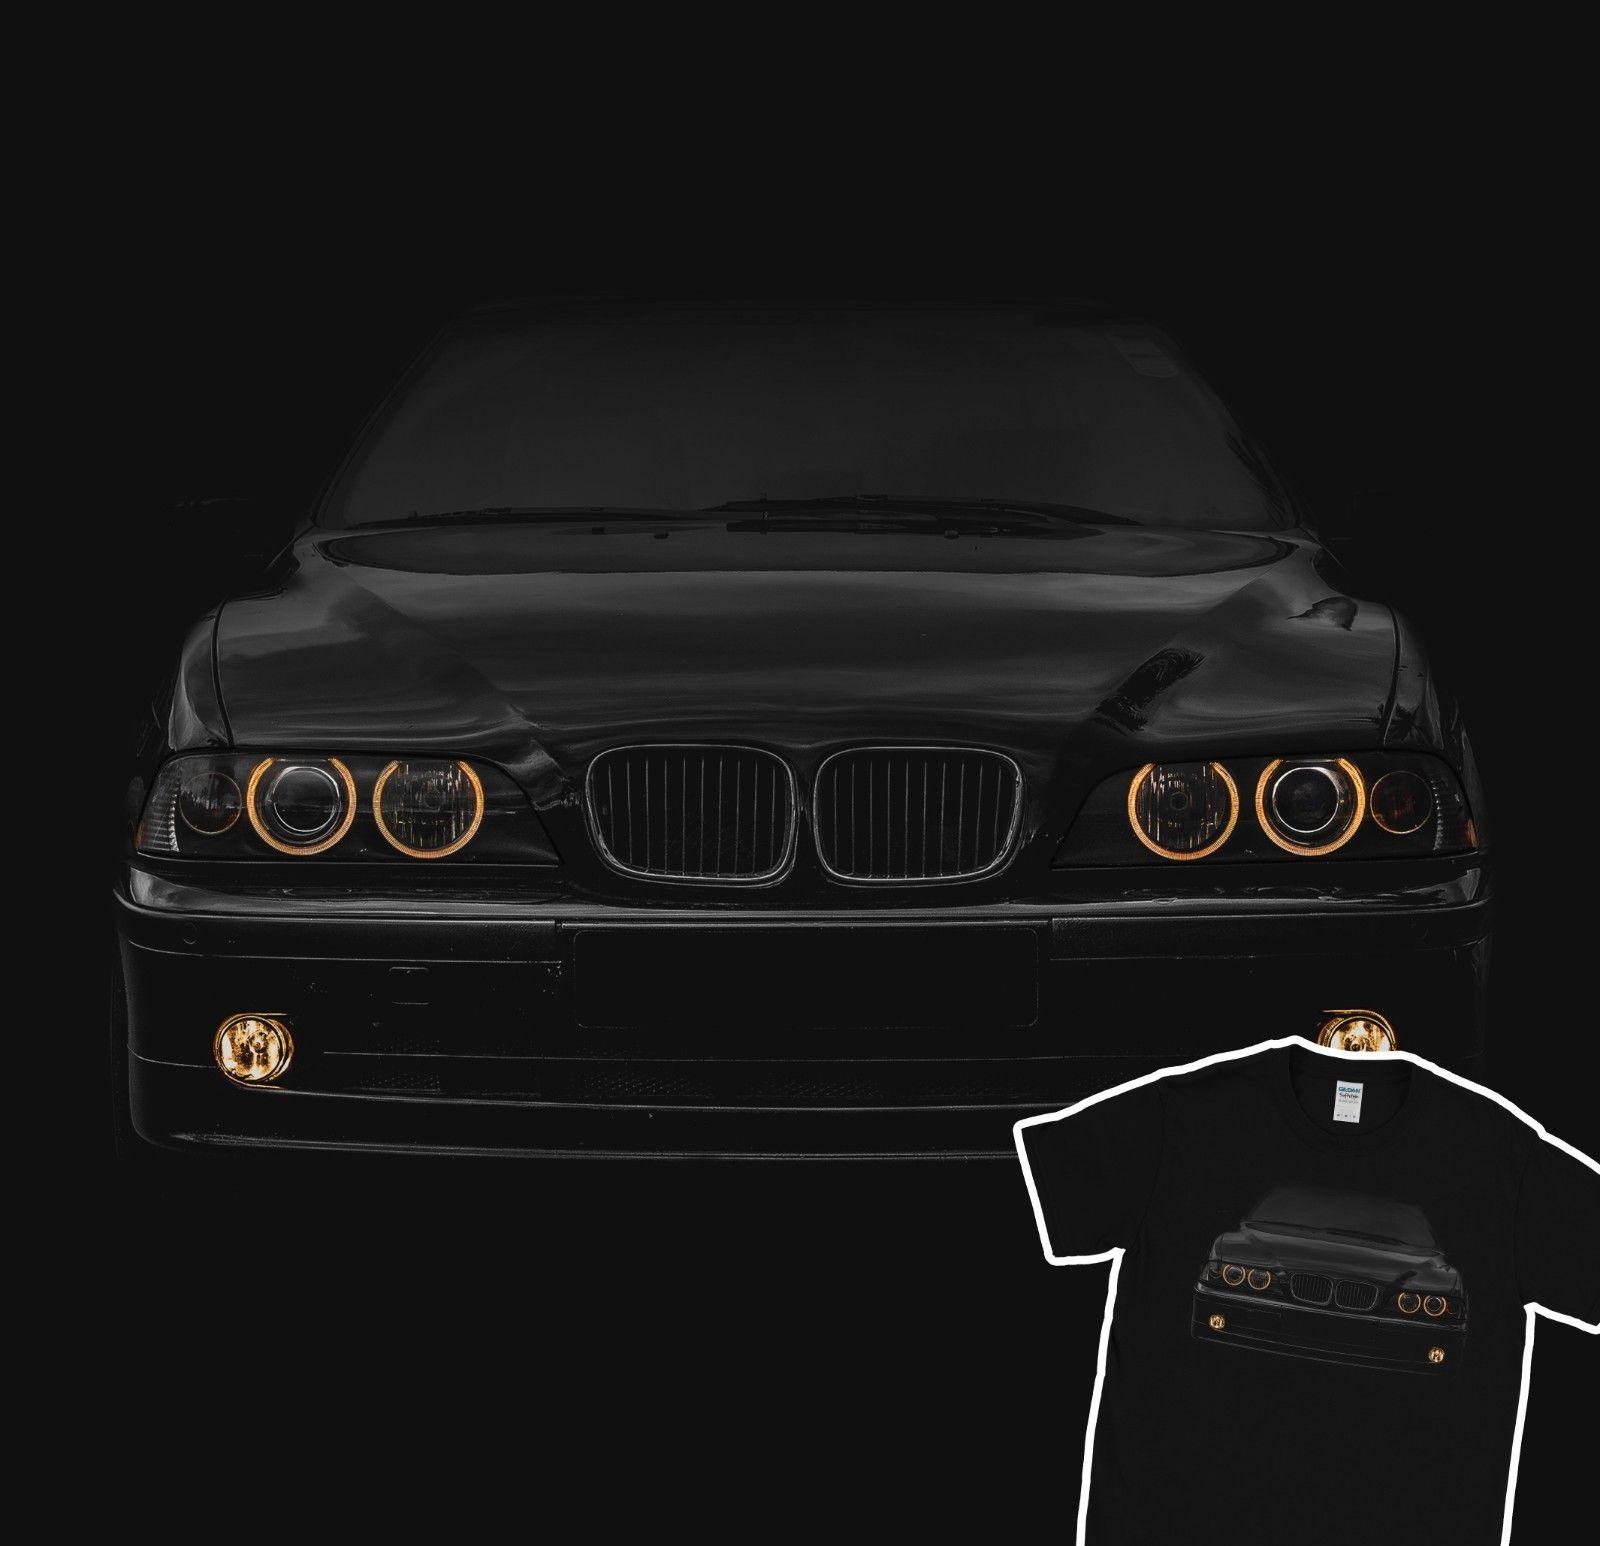 German Car E39 Yellow Headlights T-Shirt Holiday Gift Christmas Birthday Present 2019 New Brand Cheap Sale Cotton Funny Shirts